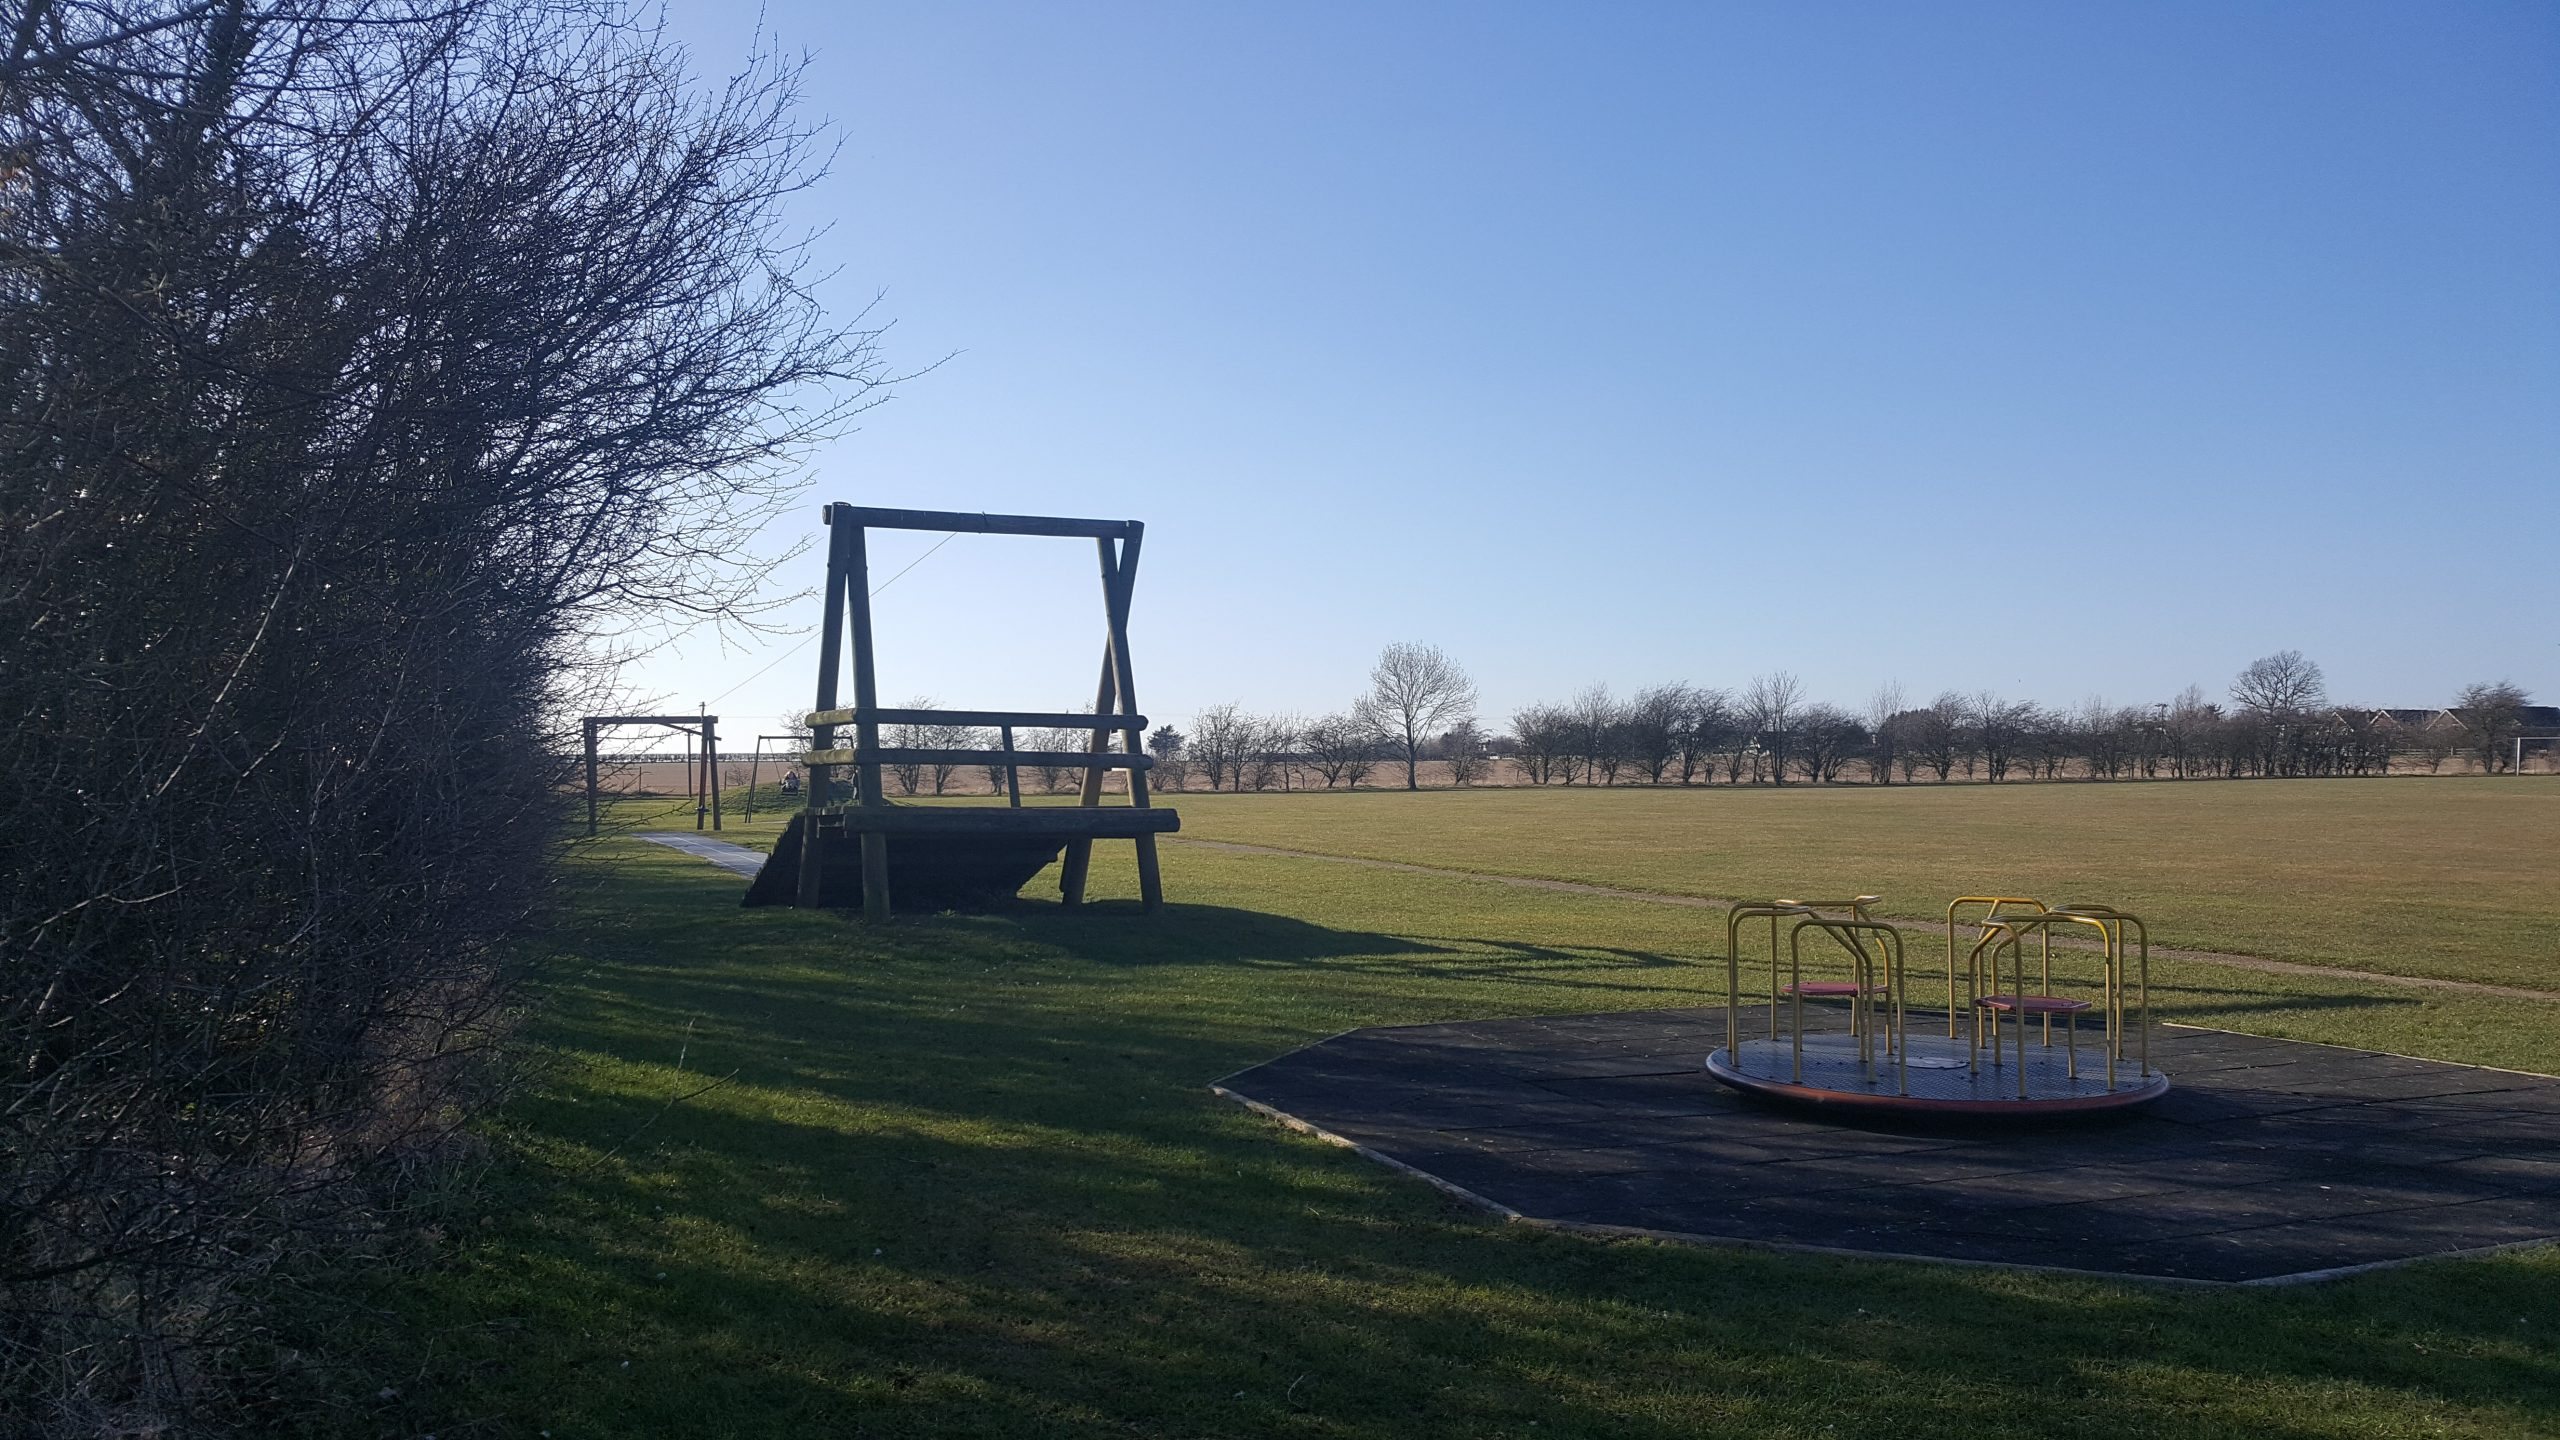 Lawling Park